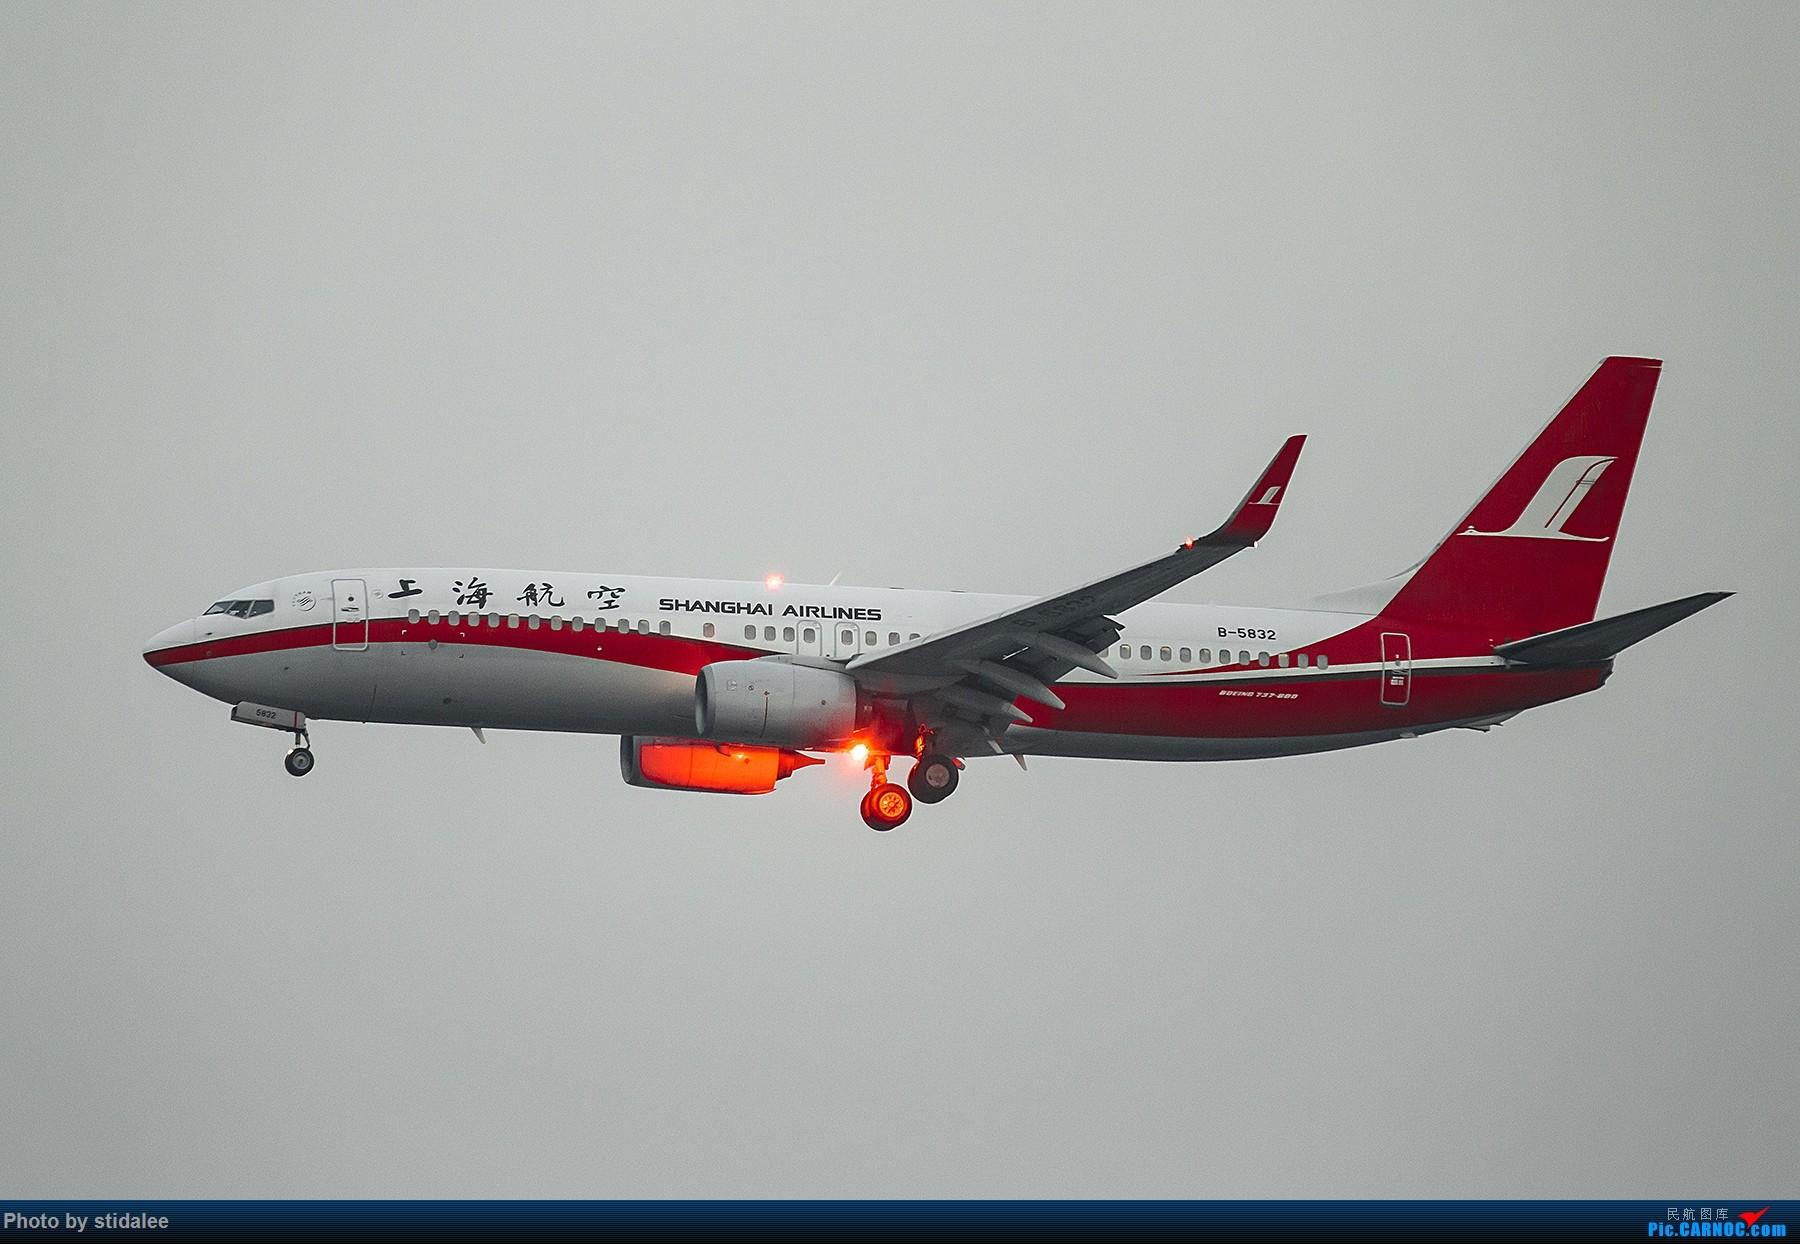 Re:[原创]SHA拍机 各种地主上航飞机 最喜欢的涂装 BOEING 737-800 B-5832 中国上海虹桥国际机场